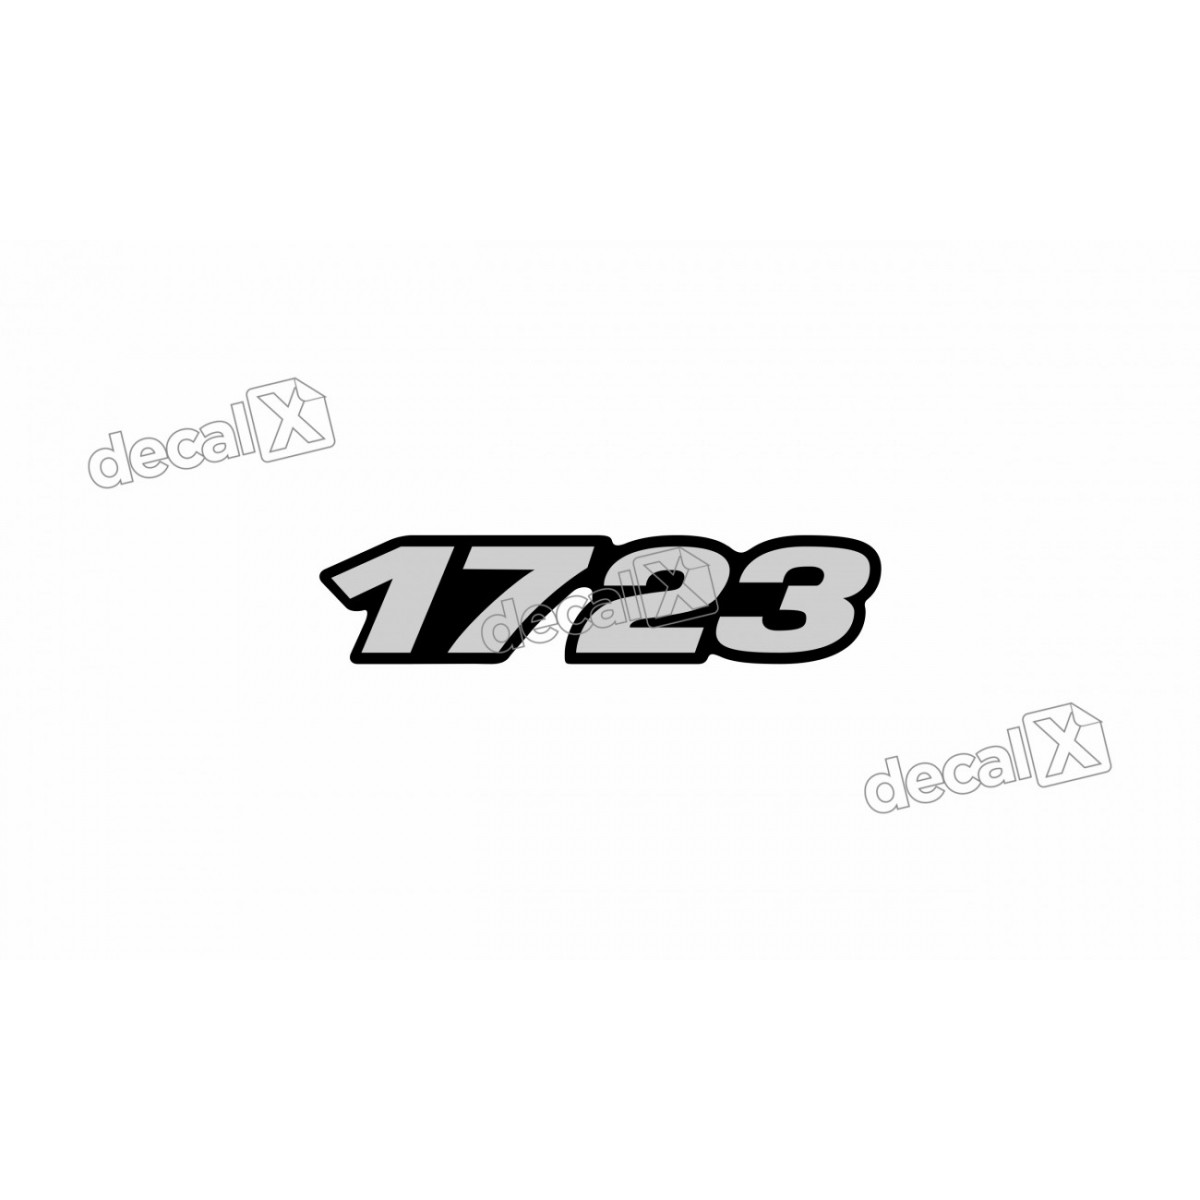 Adesivo Emblema Resinado Mercedes 1723 Cm62 Decalx